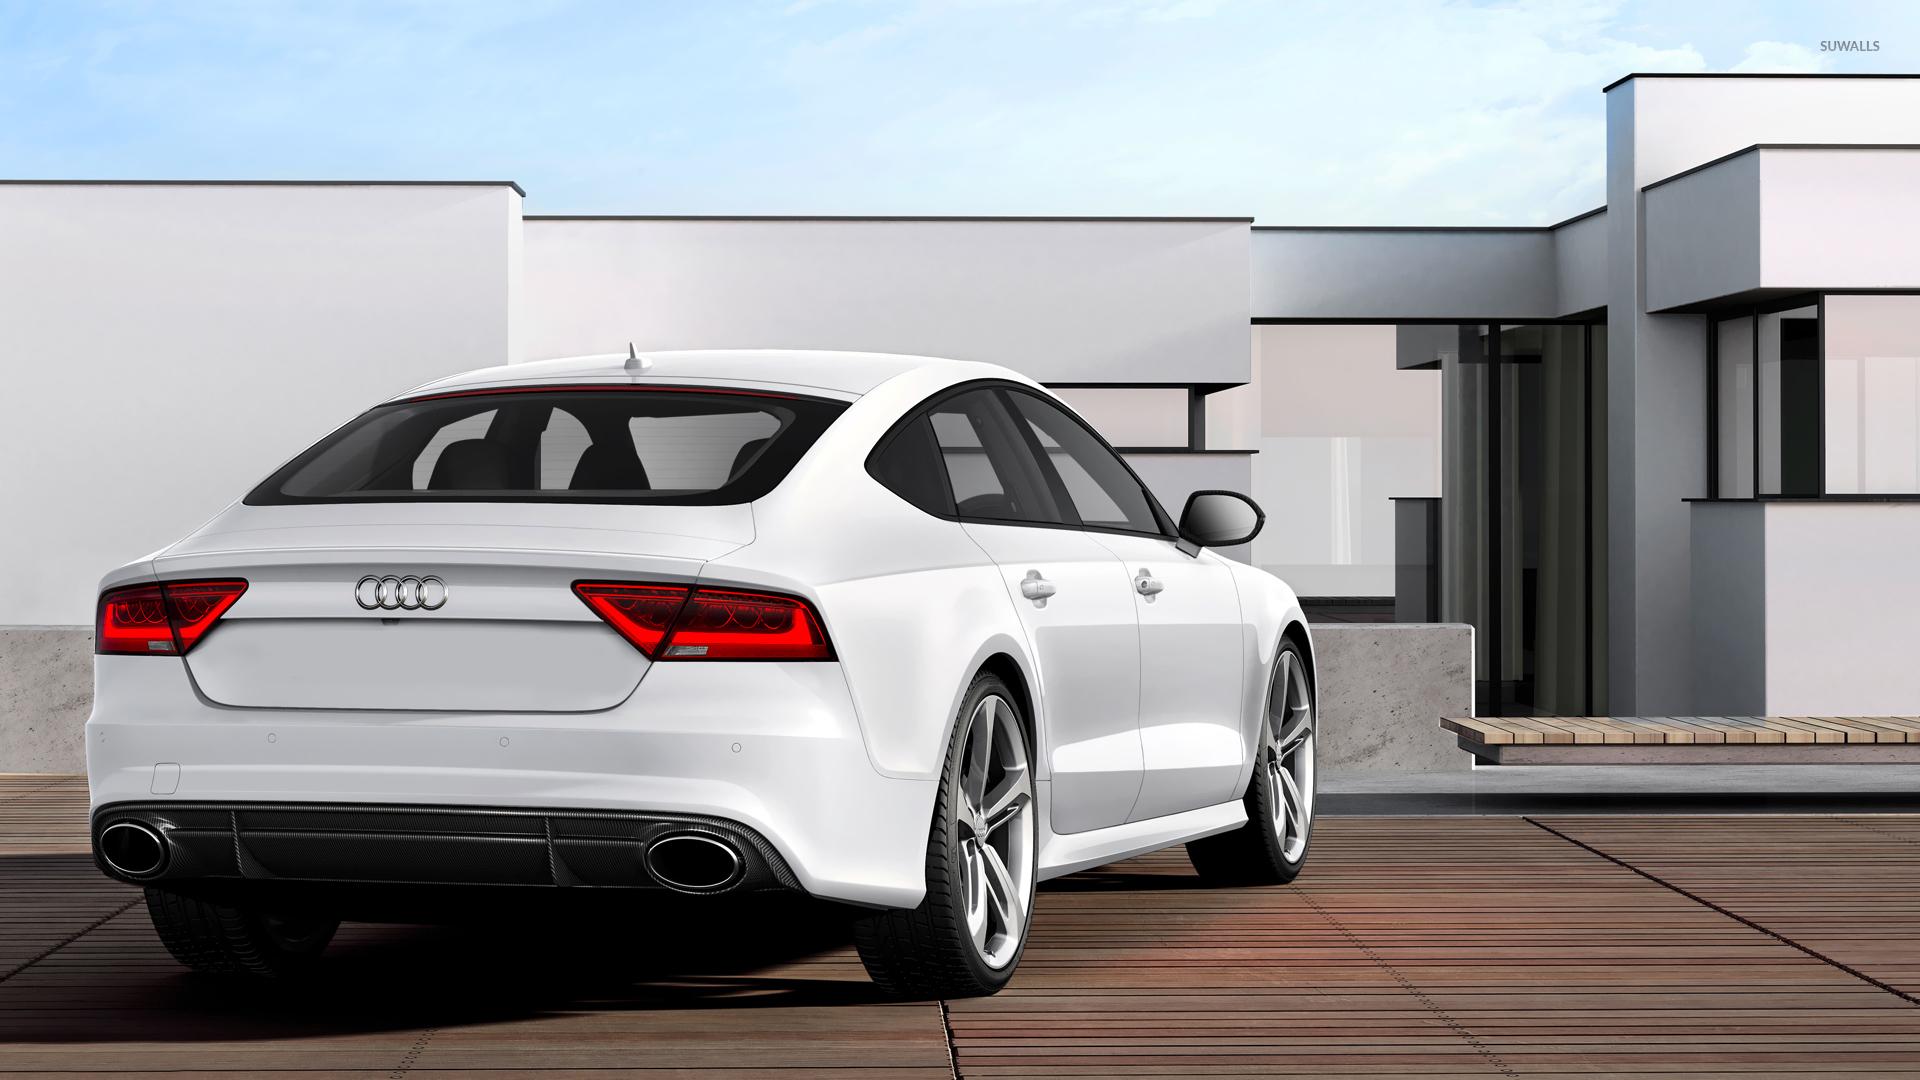 Back View Of A Audi RS Sportback Wallpaper Car Wallpapers - Audi car 4k wallpaper